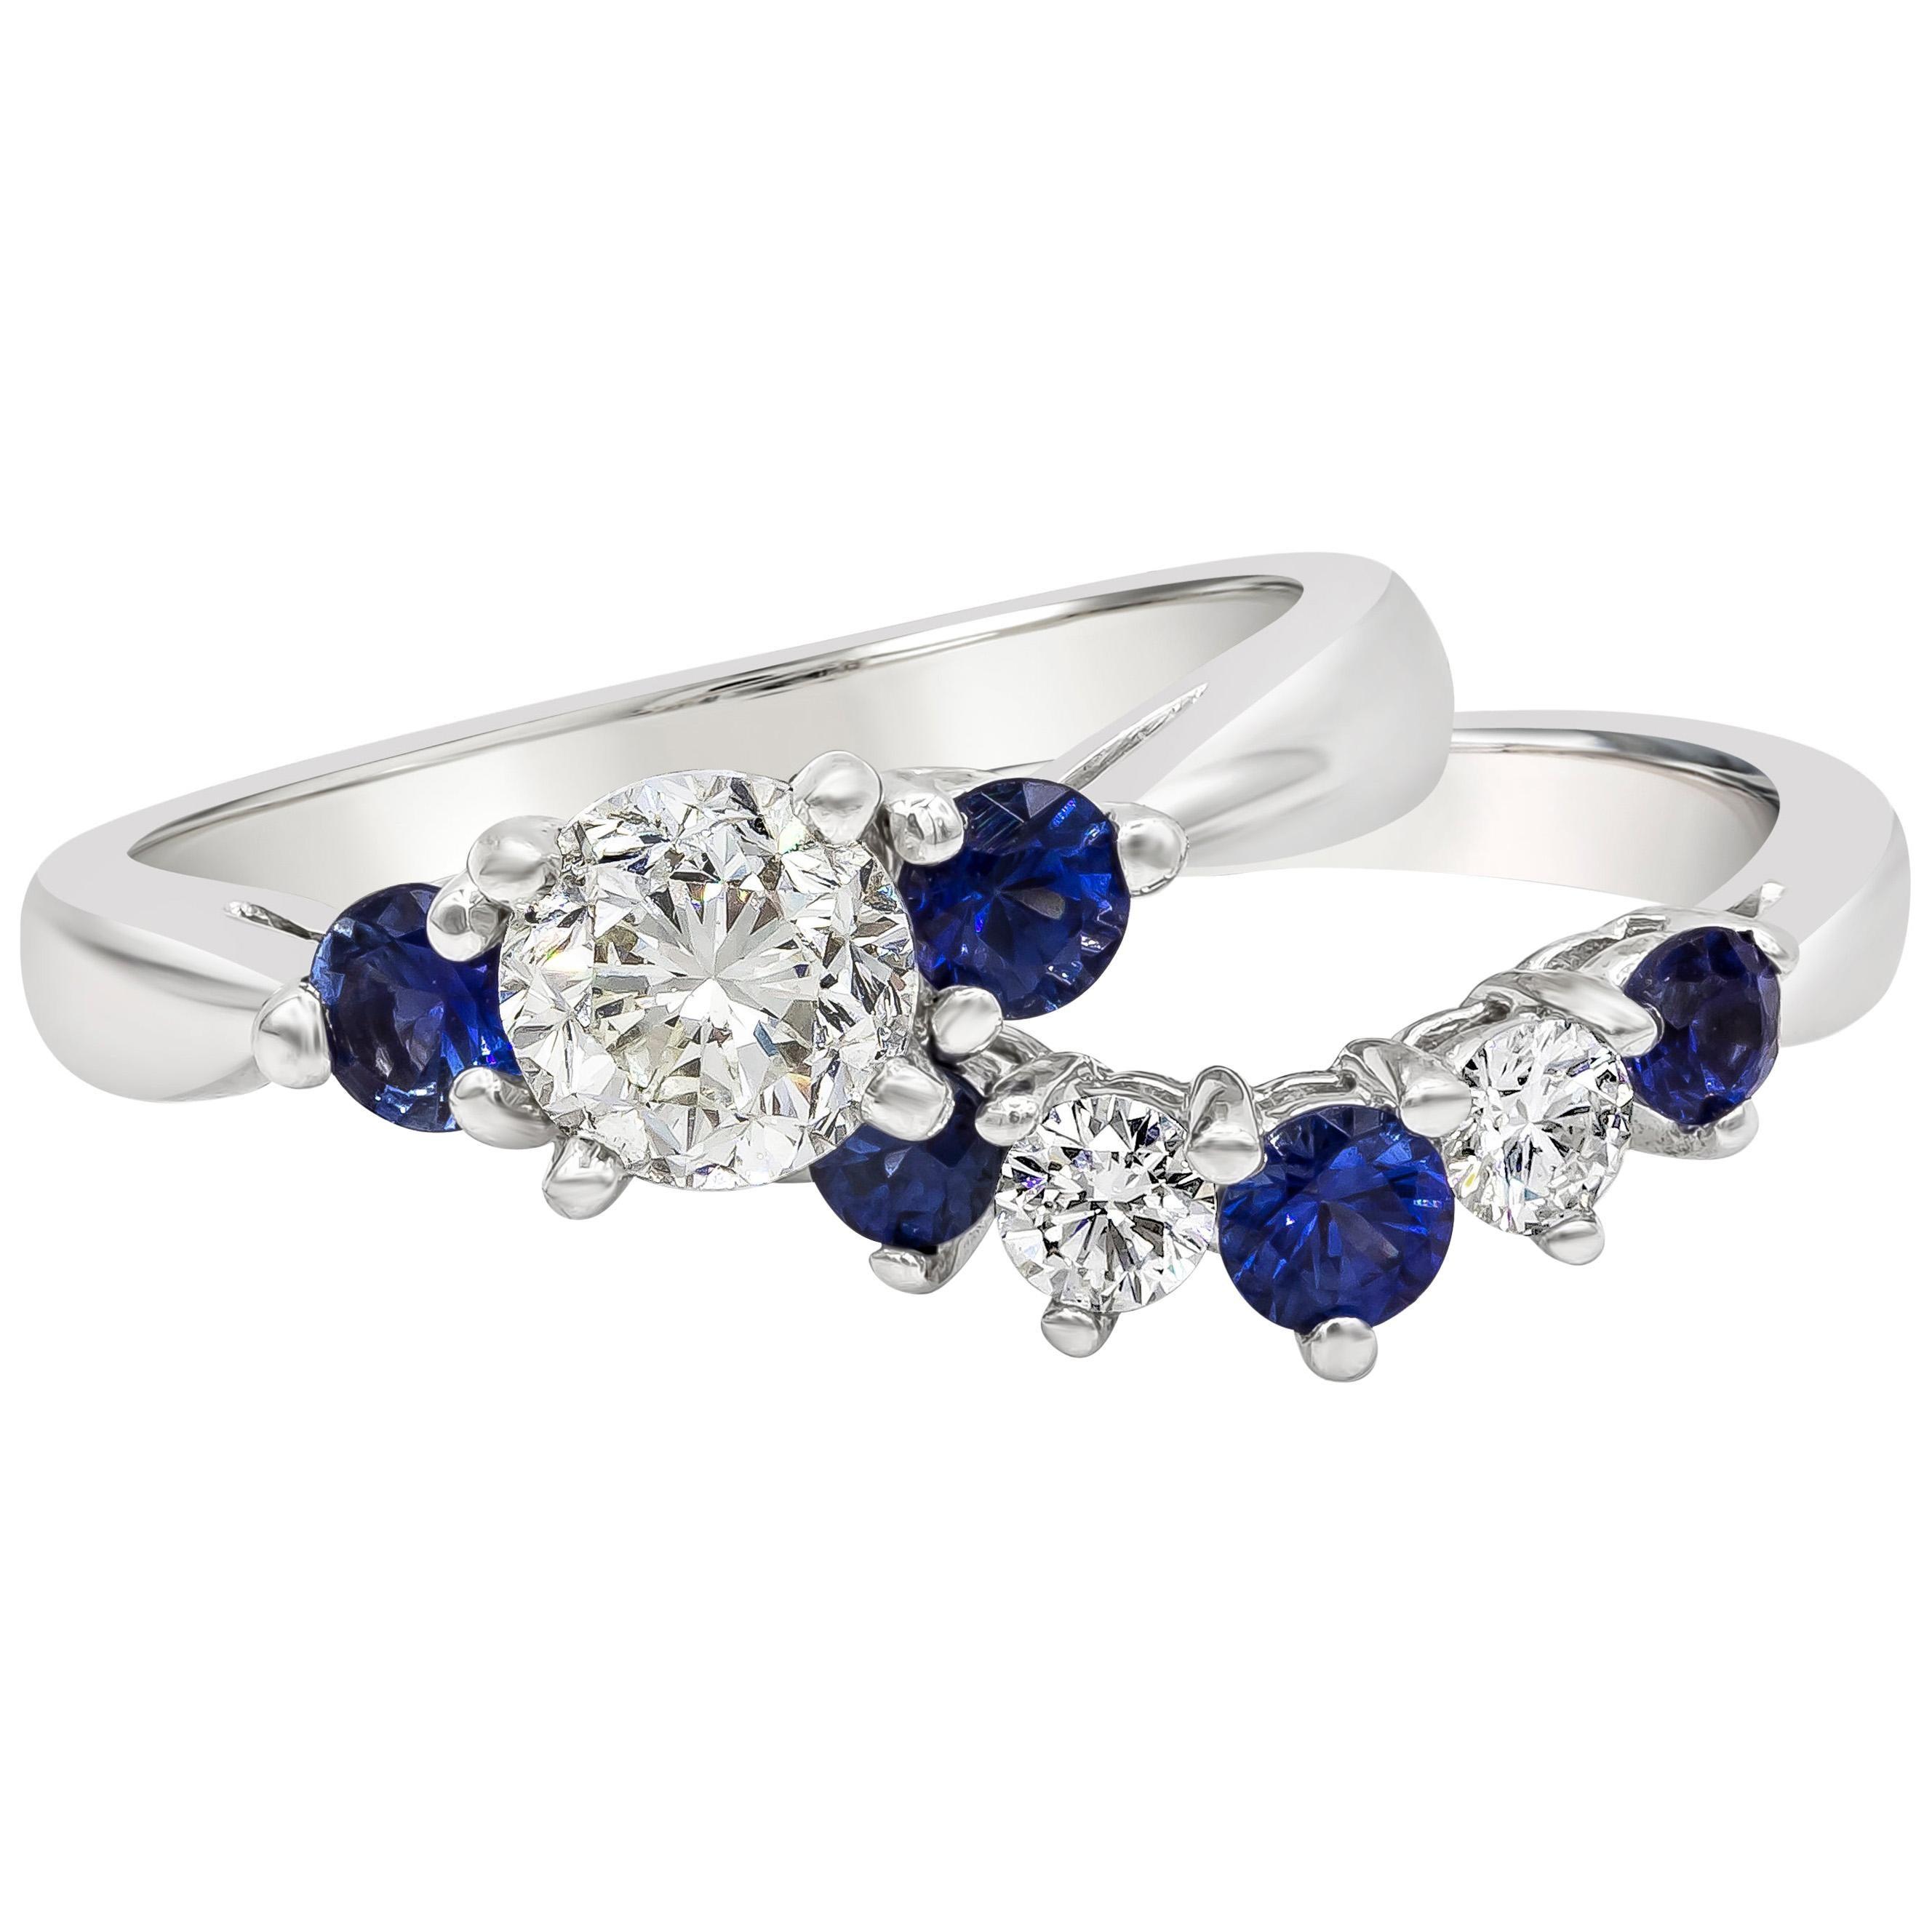 Diamond and Blue Sapphire Three-Stone Engagement Ring and Wedding Band Set